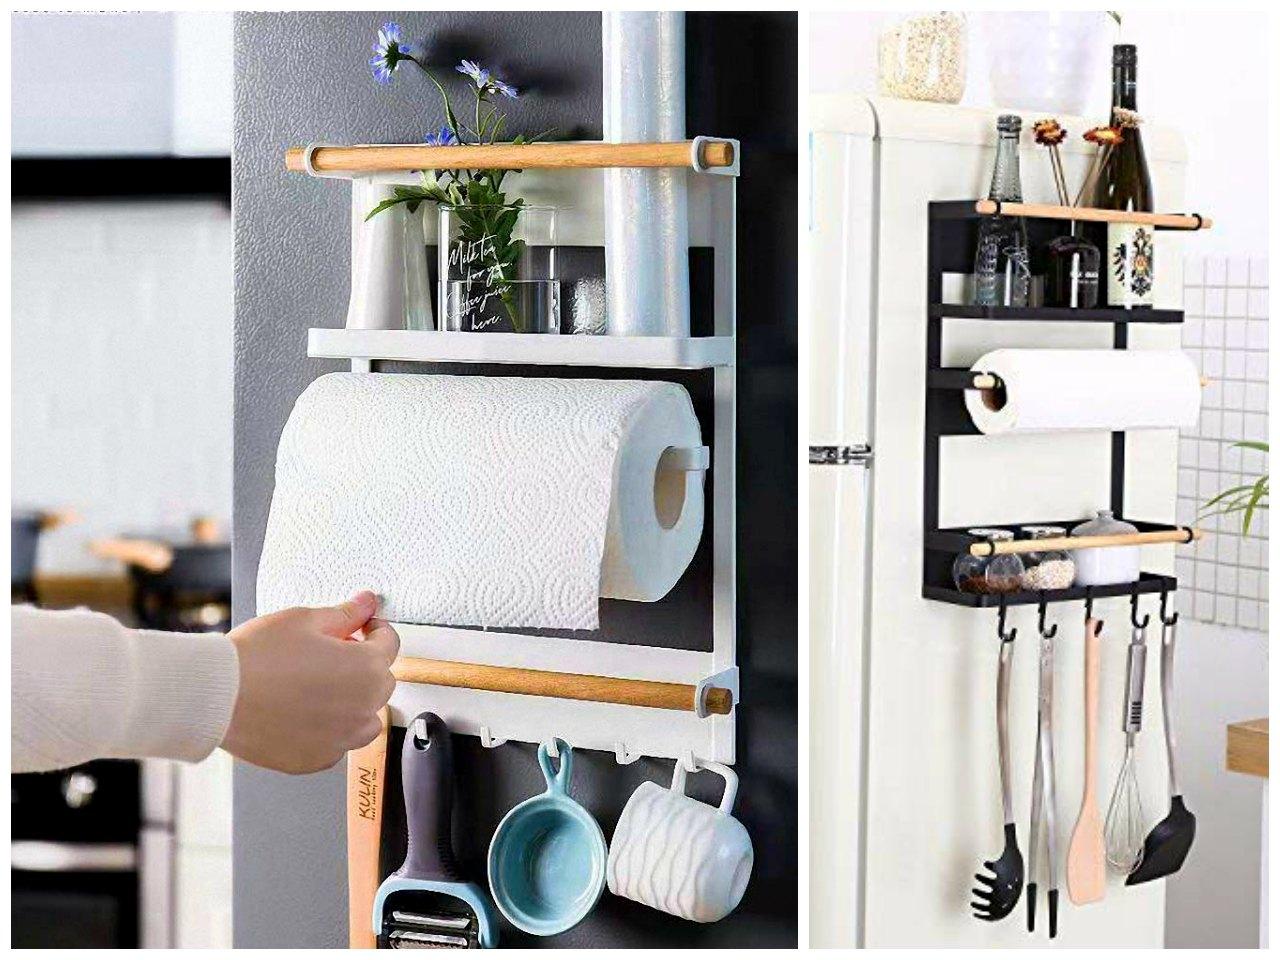 Magnetic Kitchen Rack